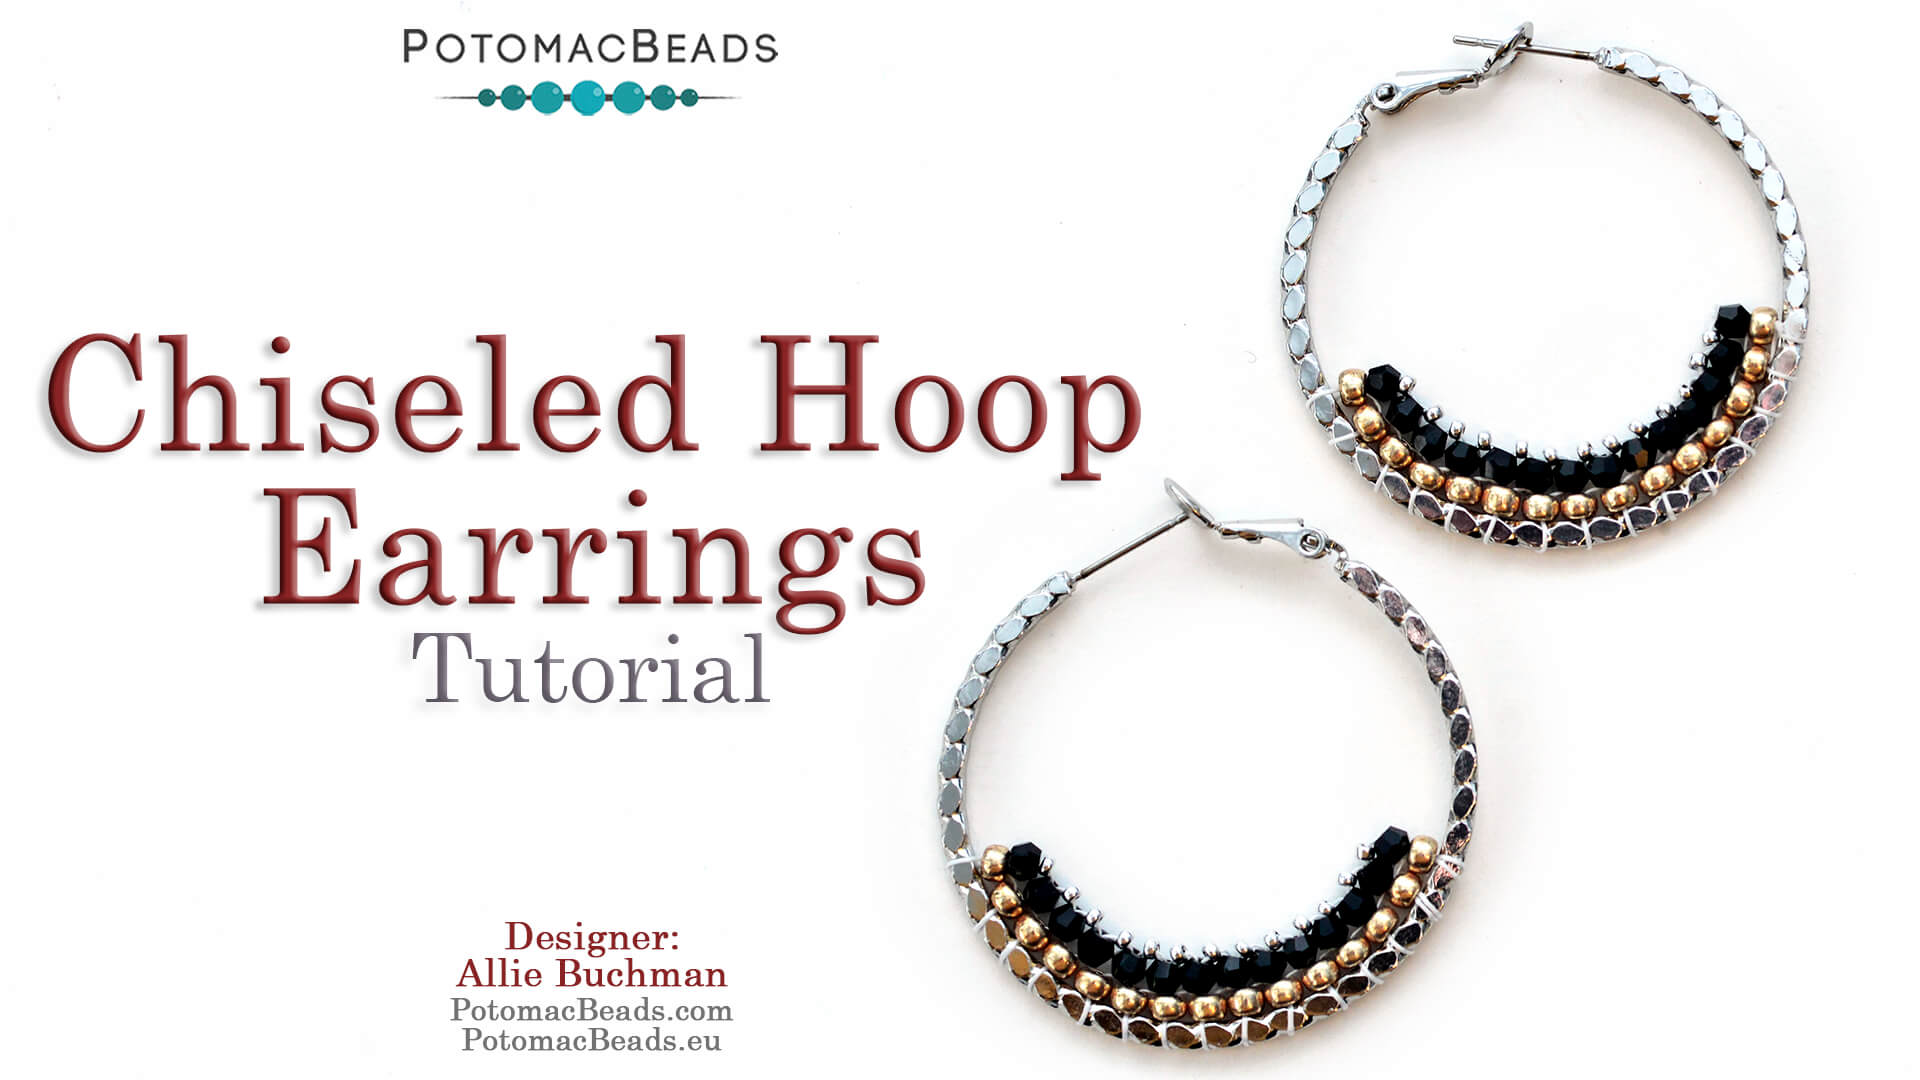 How to Bead Jewelry / Beading Tutorials & Jewel Making Videos / Earring Projects / Chiseled Hoop Earrings Tutorial